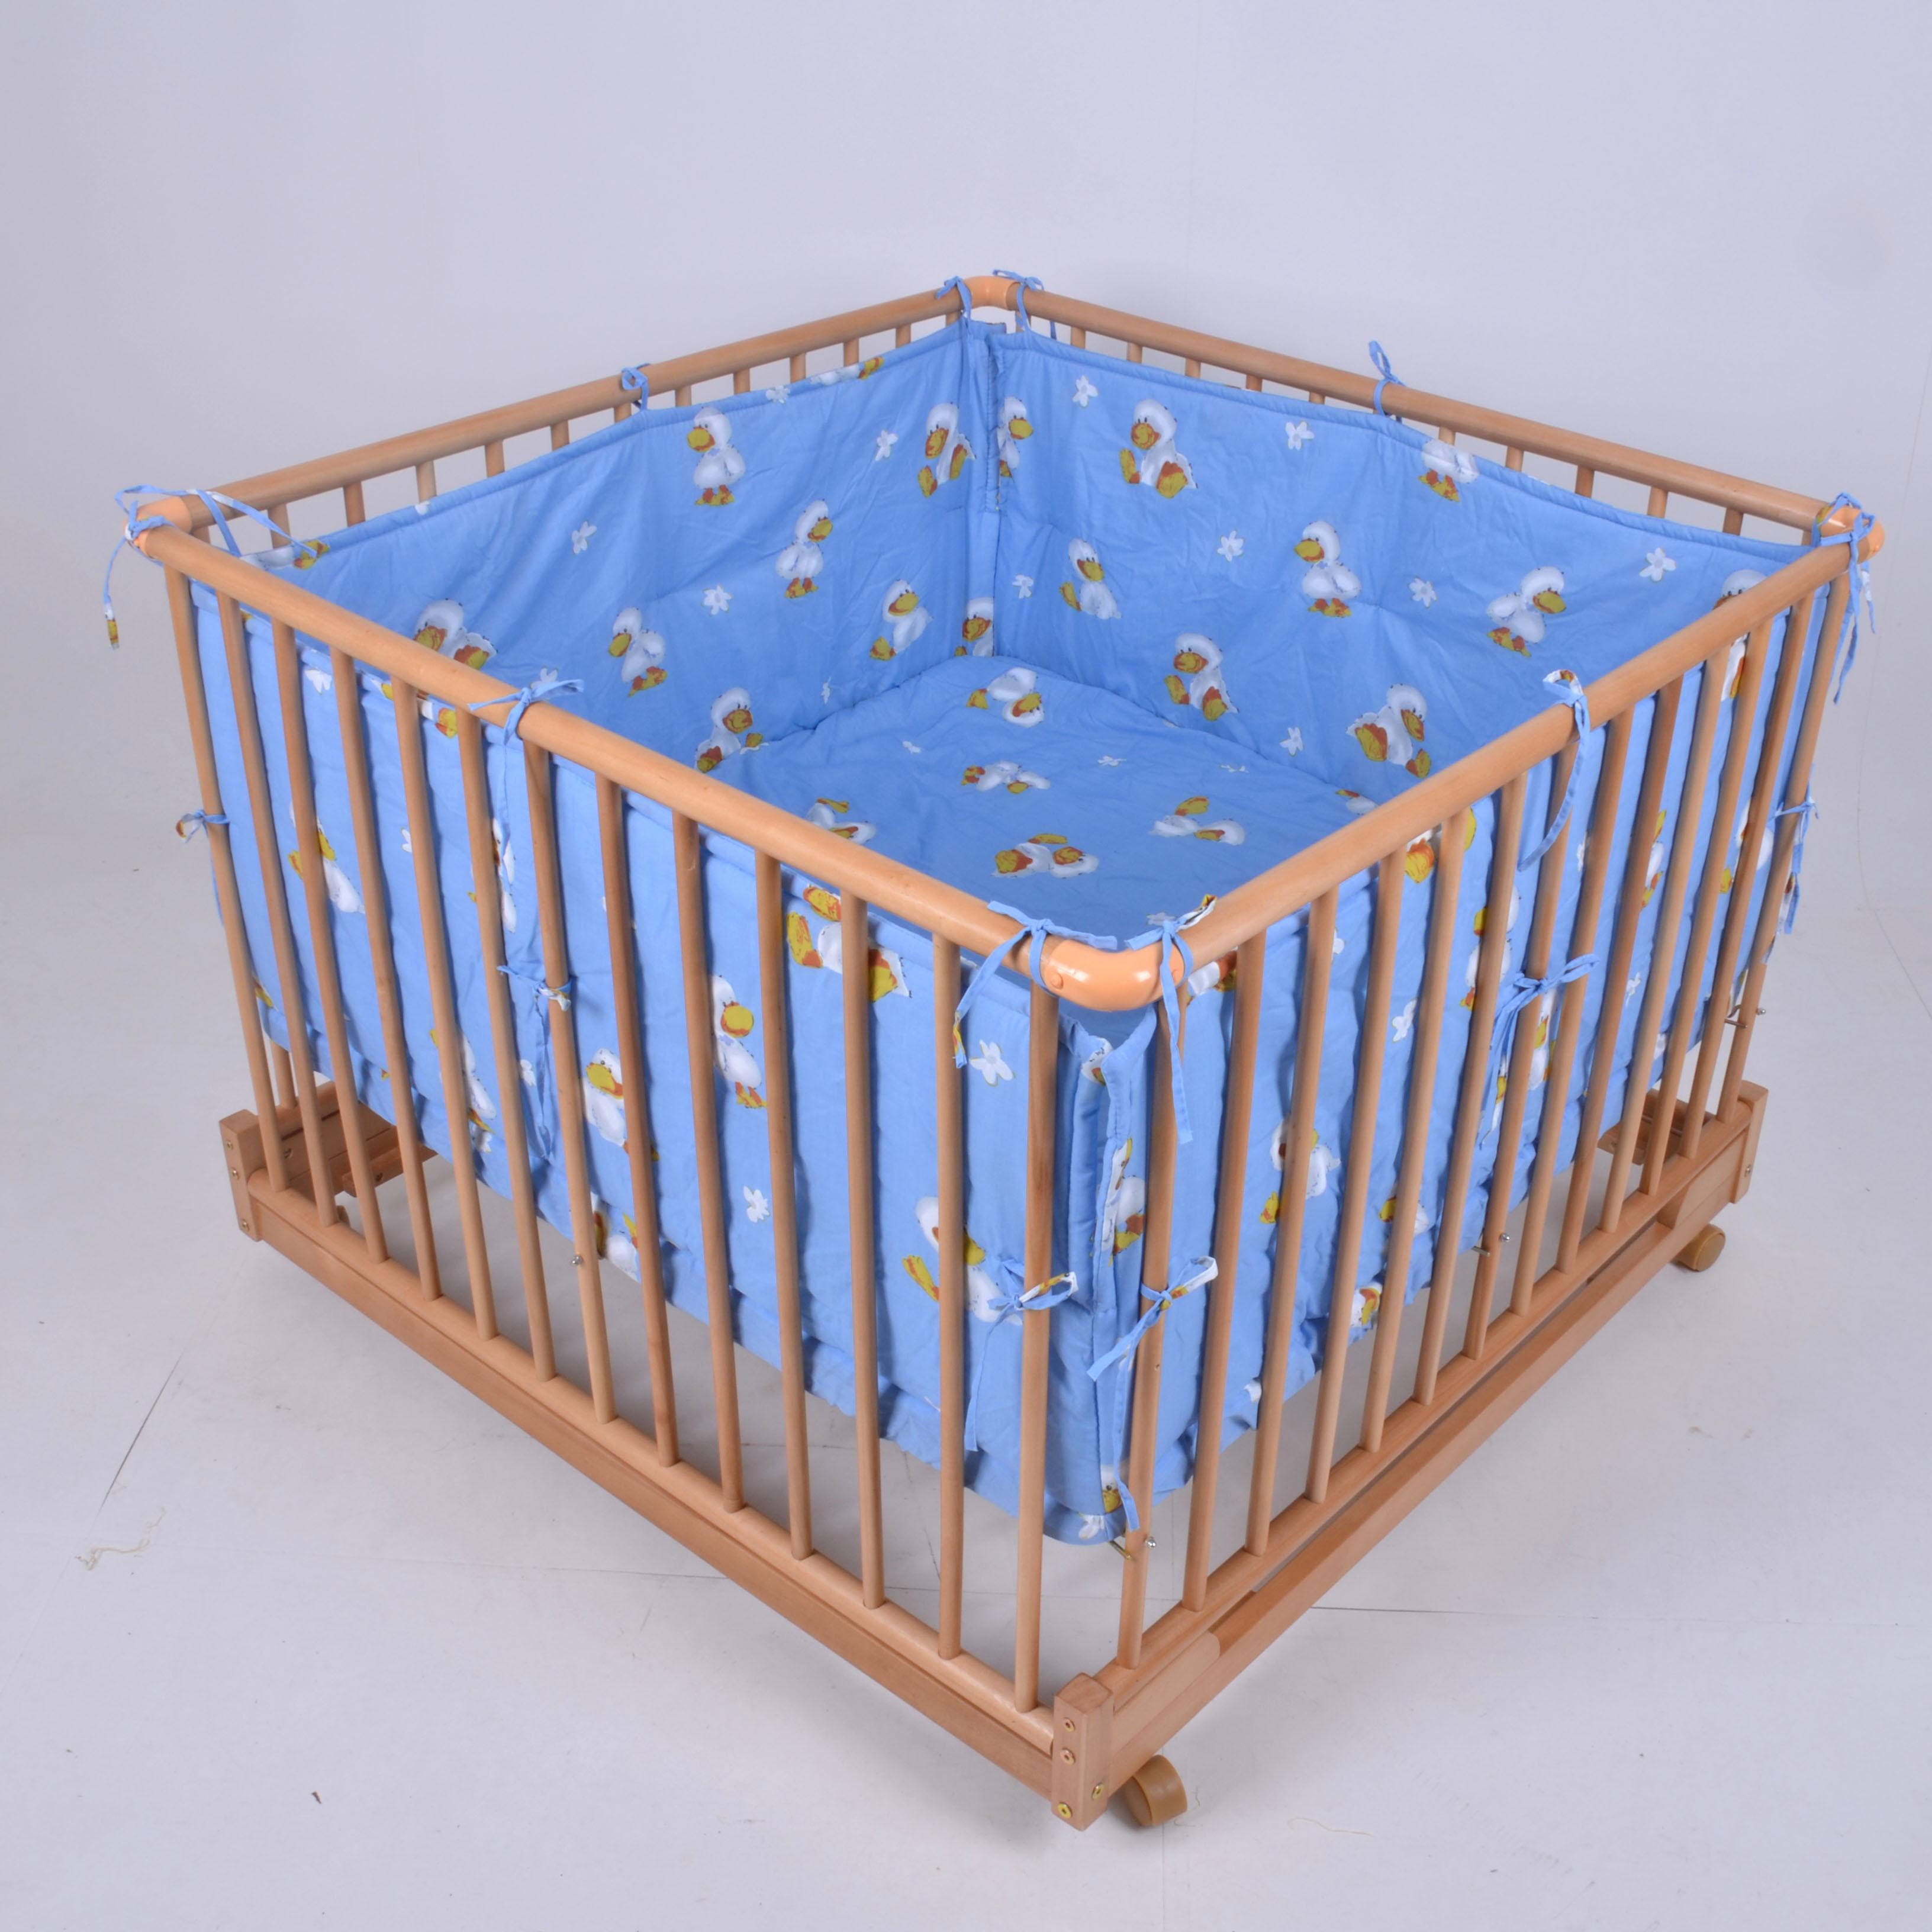 Online Buy Grosir Bayi Kembar Permainan From China Bayi Kembar